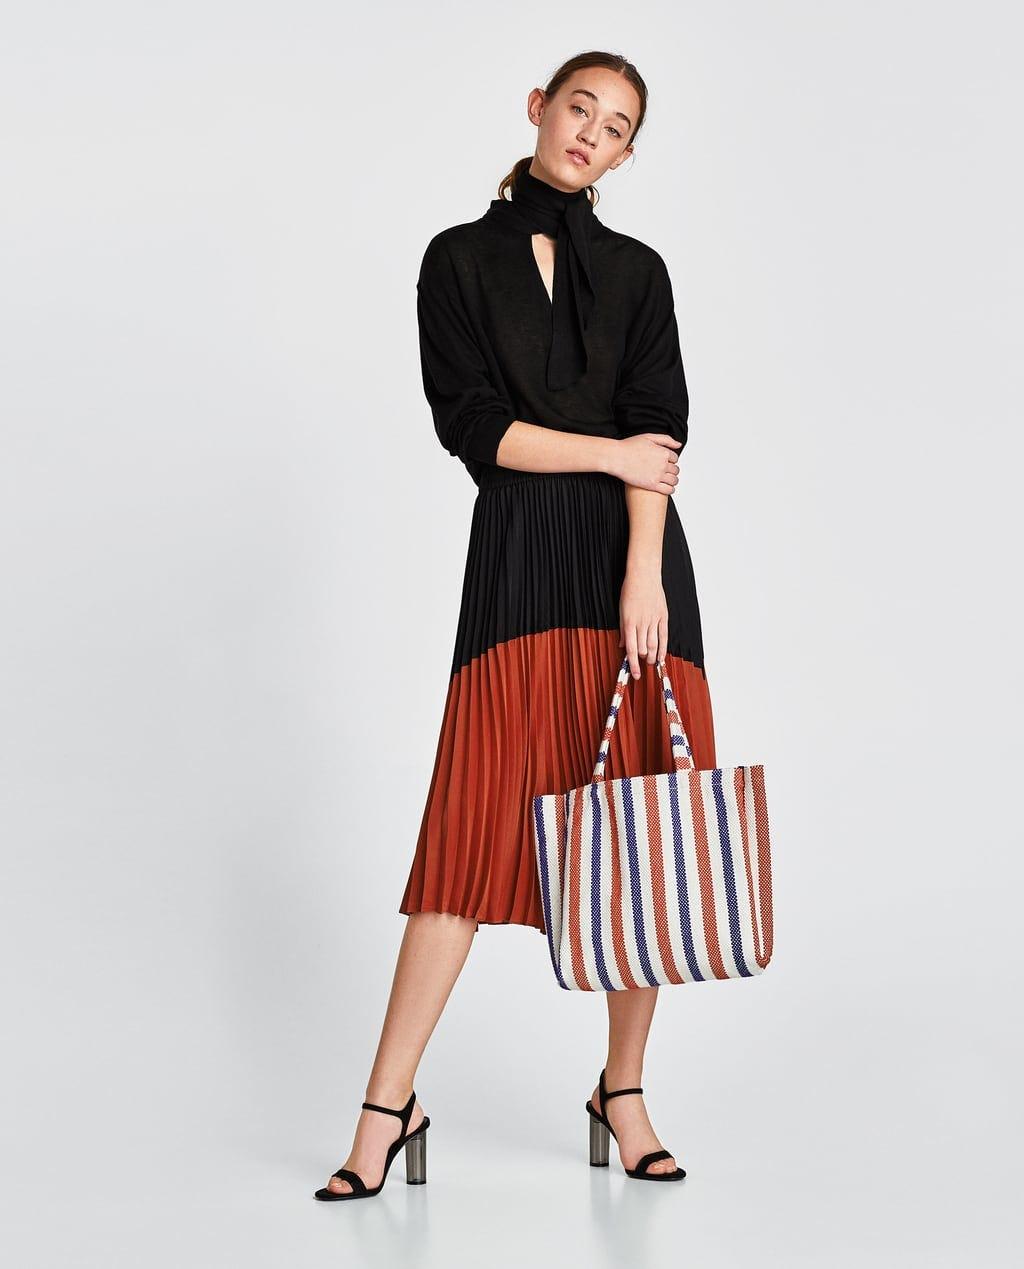 2c390982cae1 Two-Tone Trend Fashion